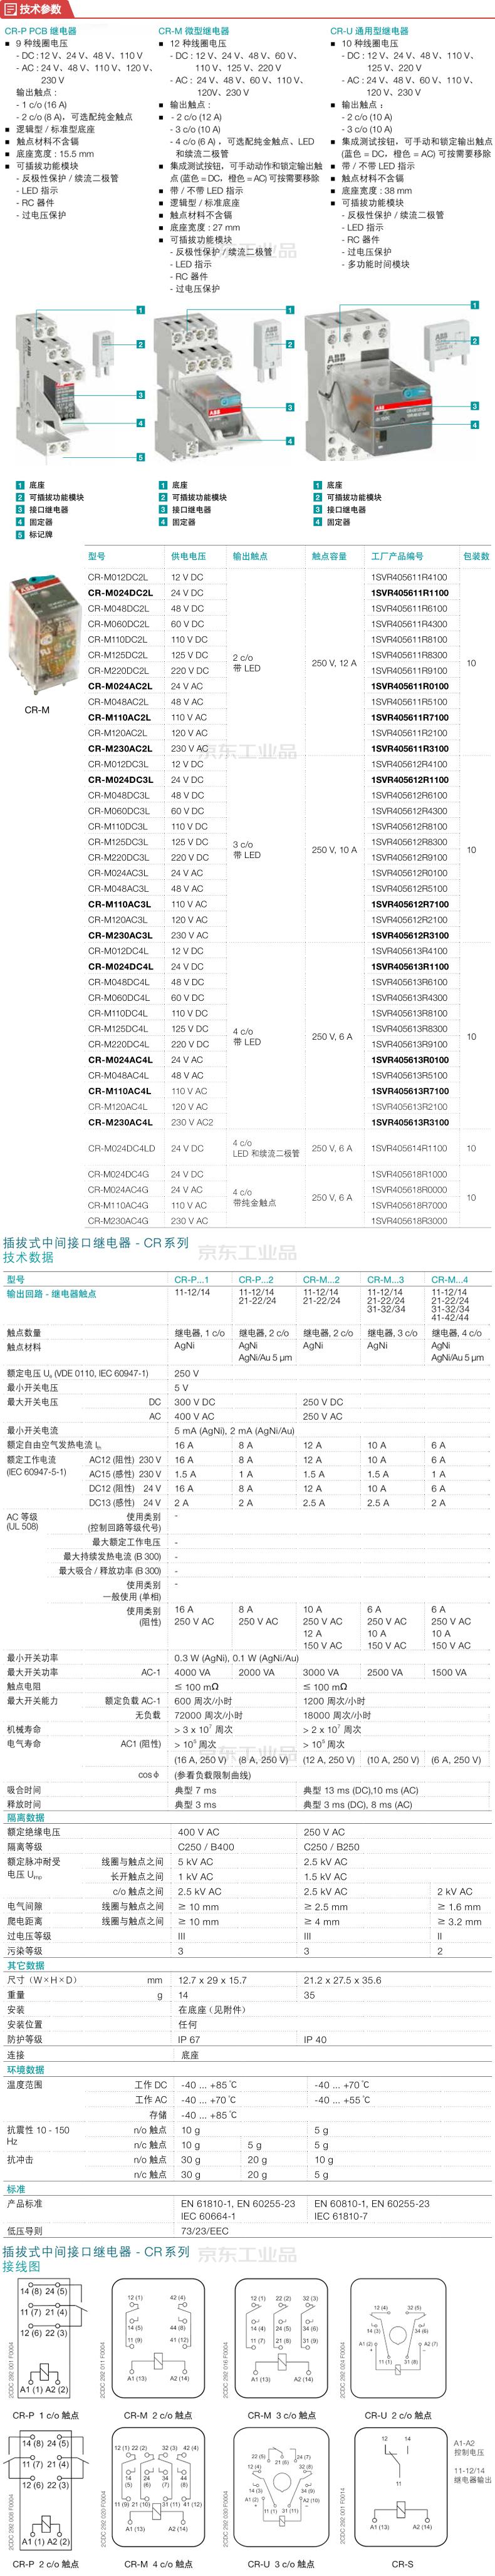 ABB 微型插拔式接口继电器;CR-M125DC4L